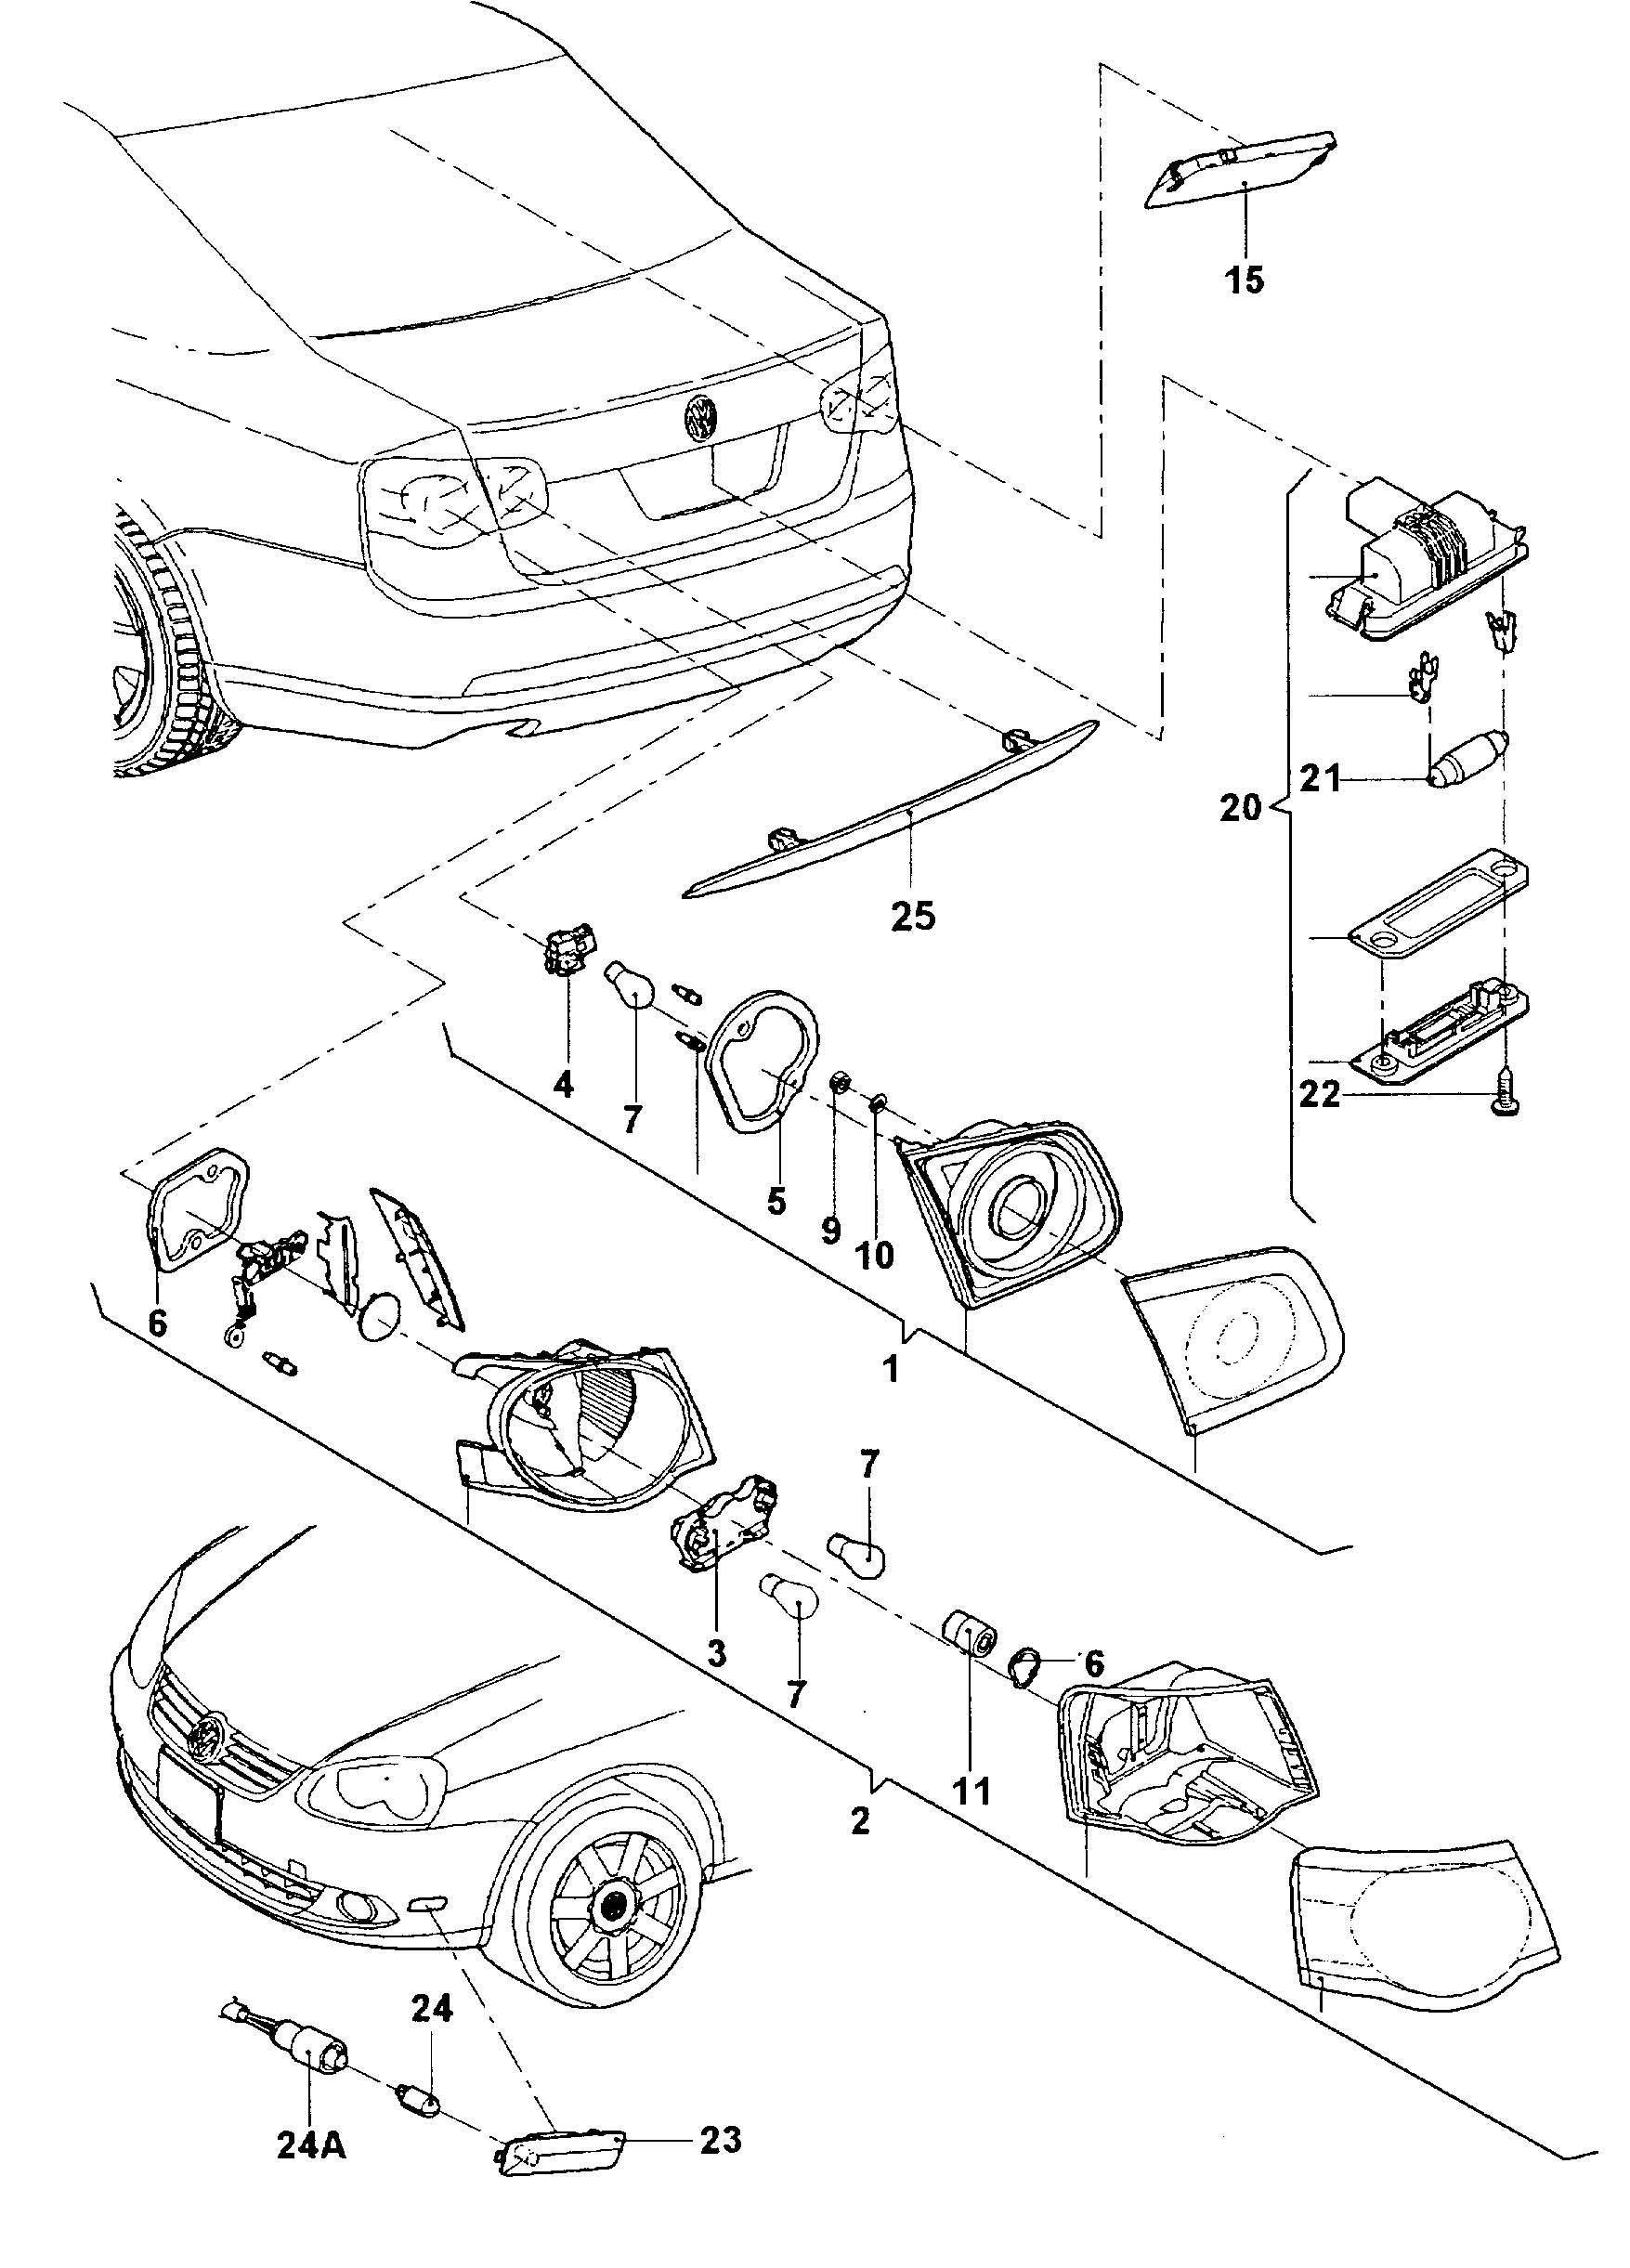 2009 Volkswagen Side marker light wiring harness for side